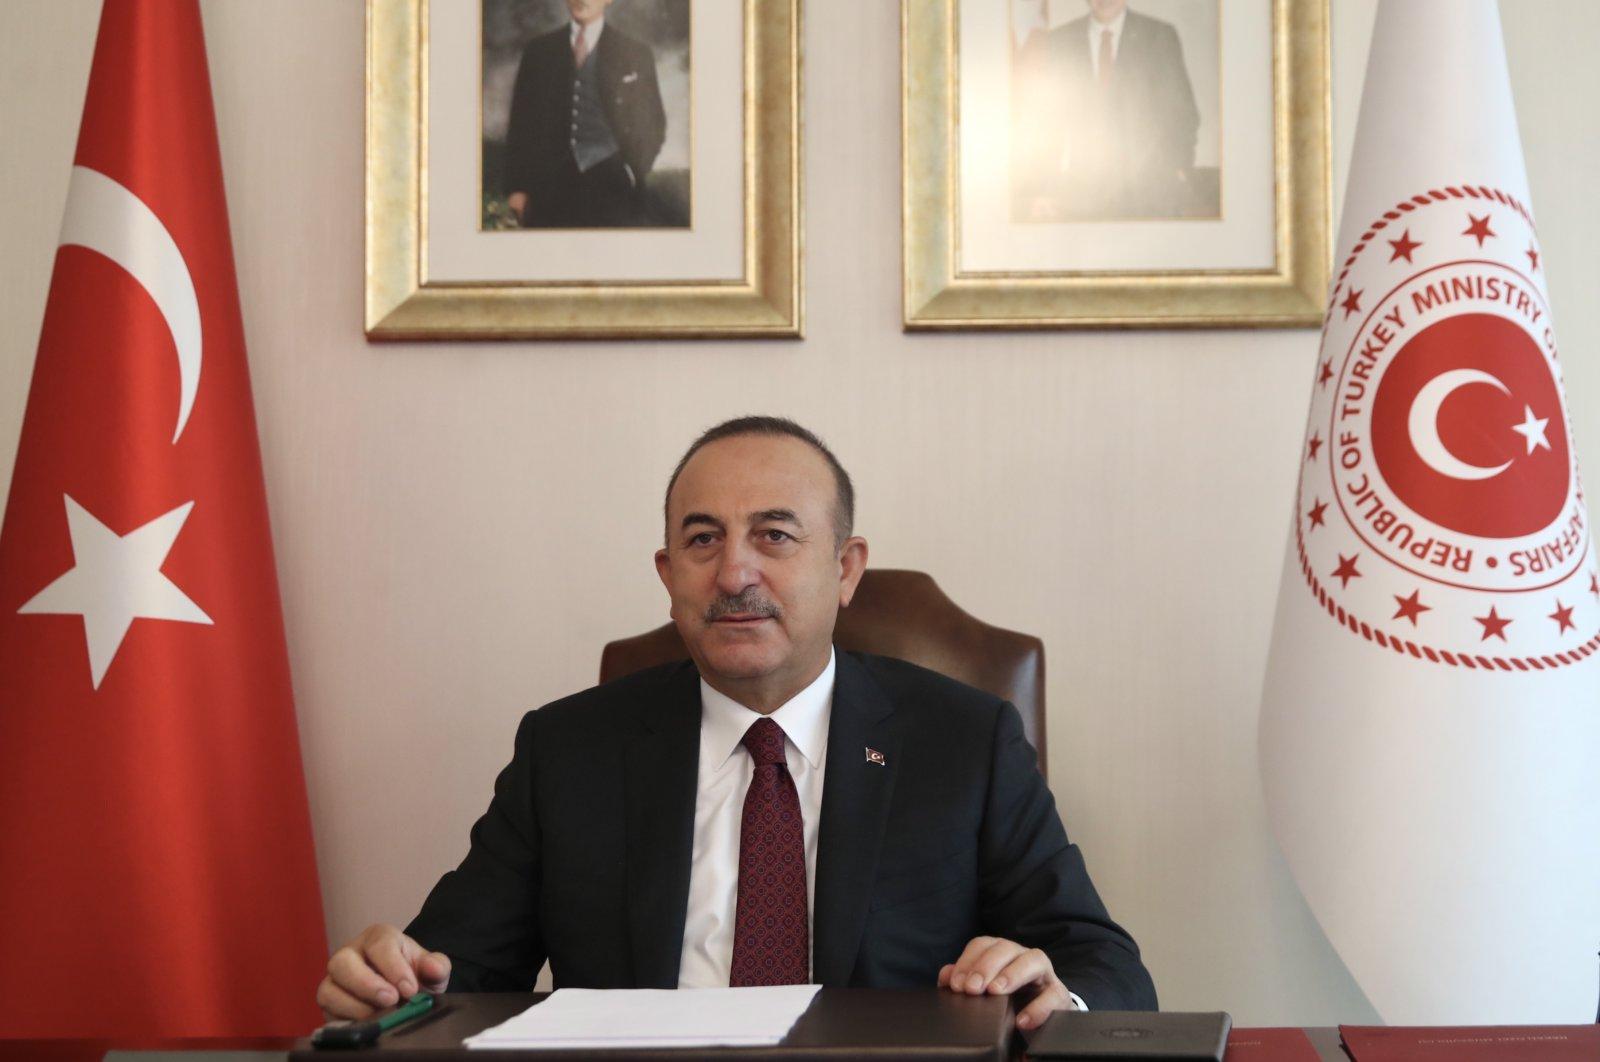 Foreign Minister Mevlüt Çavuşoğlu attends the 130th EU Council foreign ministers' meeting in Ankara, Turkey, Nov. 4, 2020. (AA Photo)